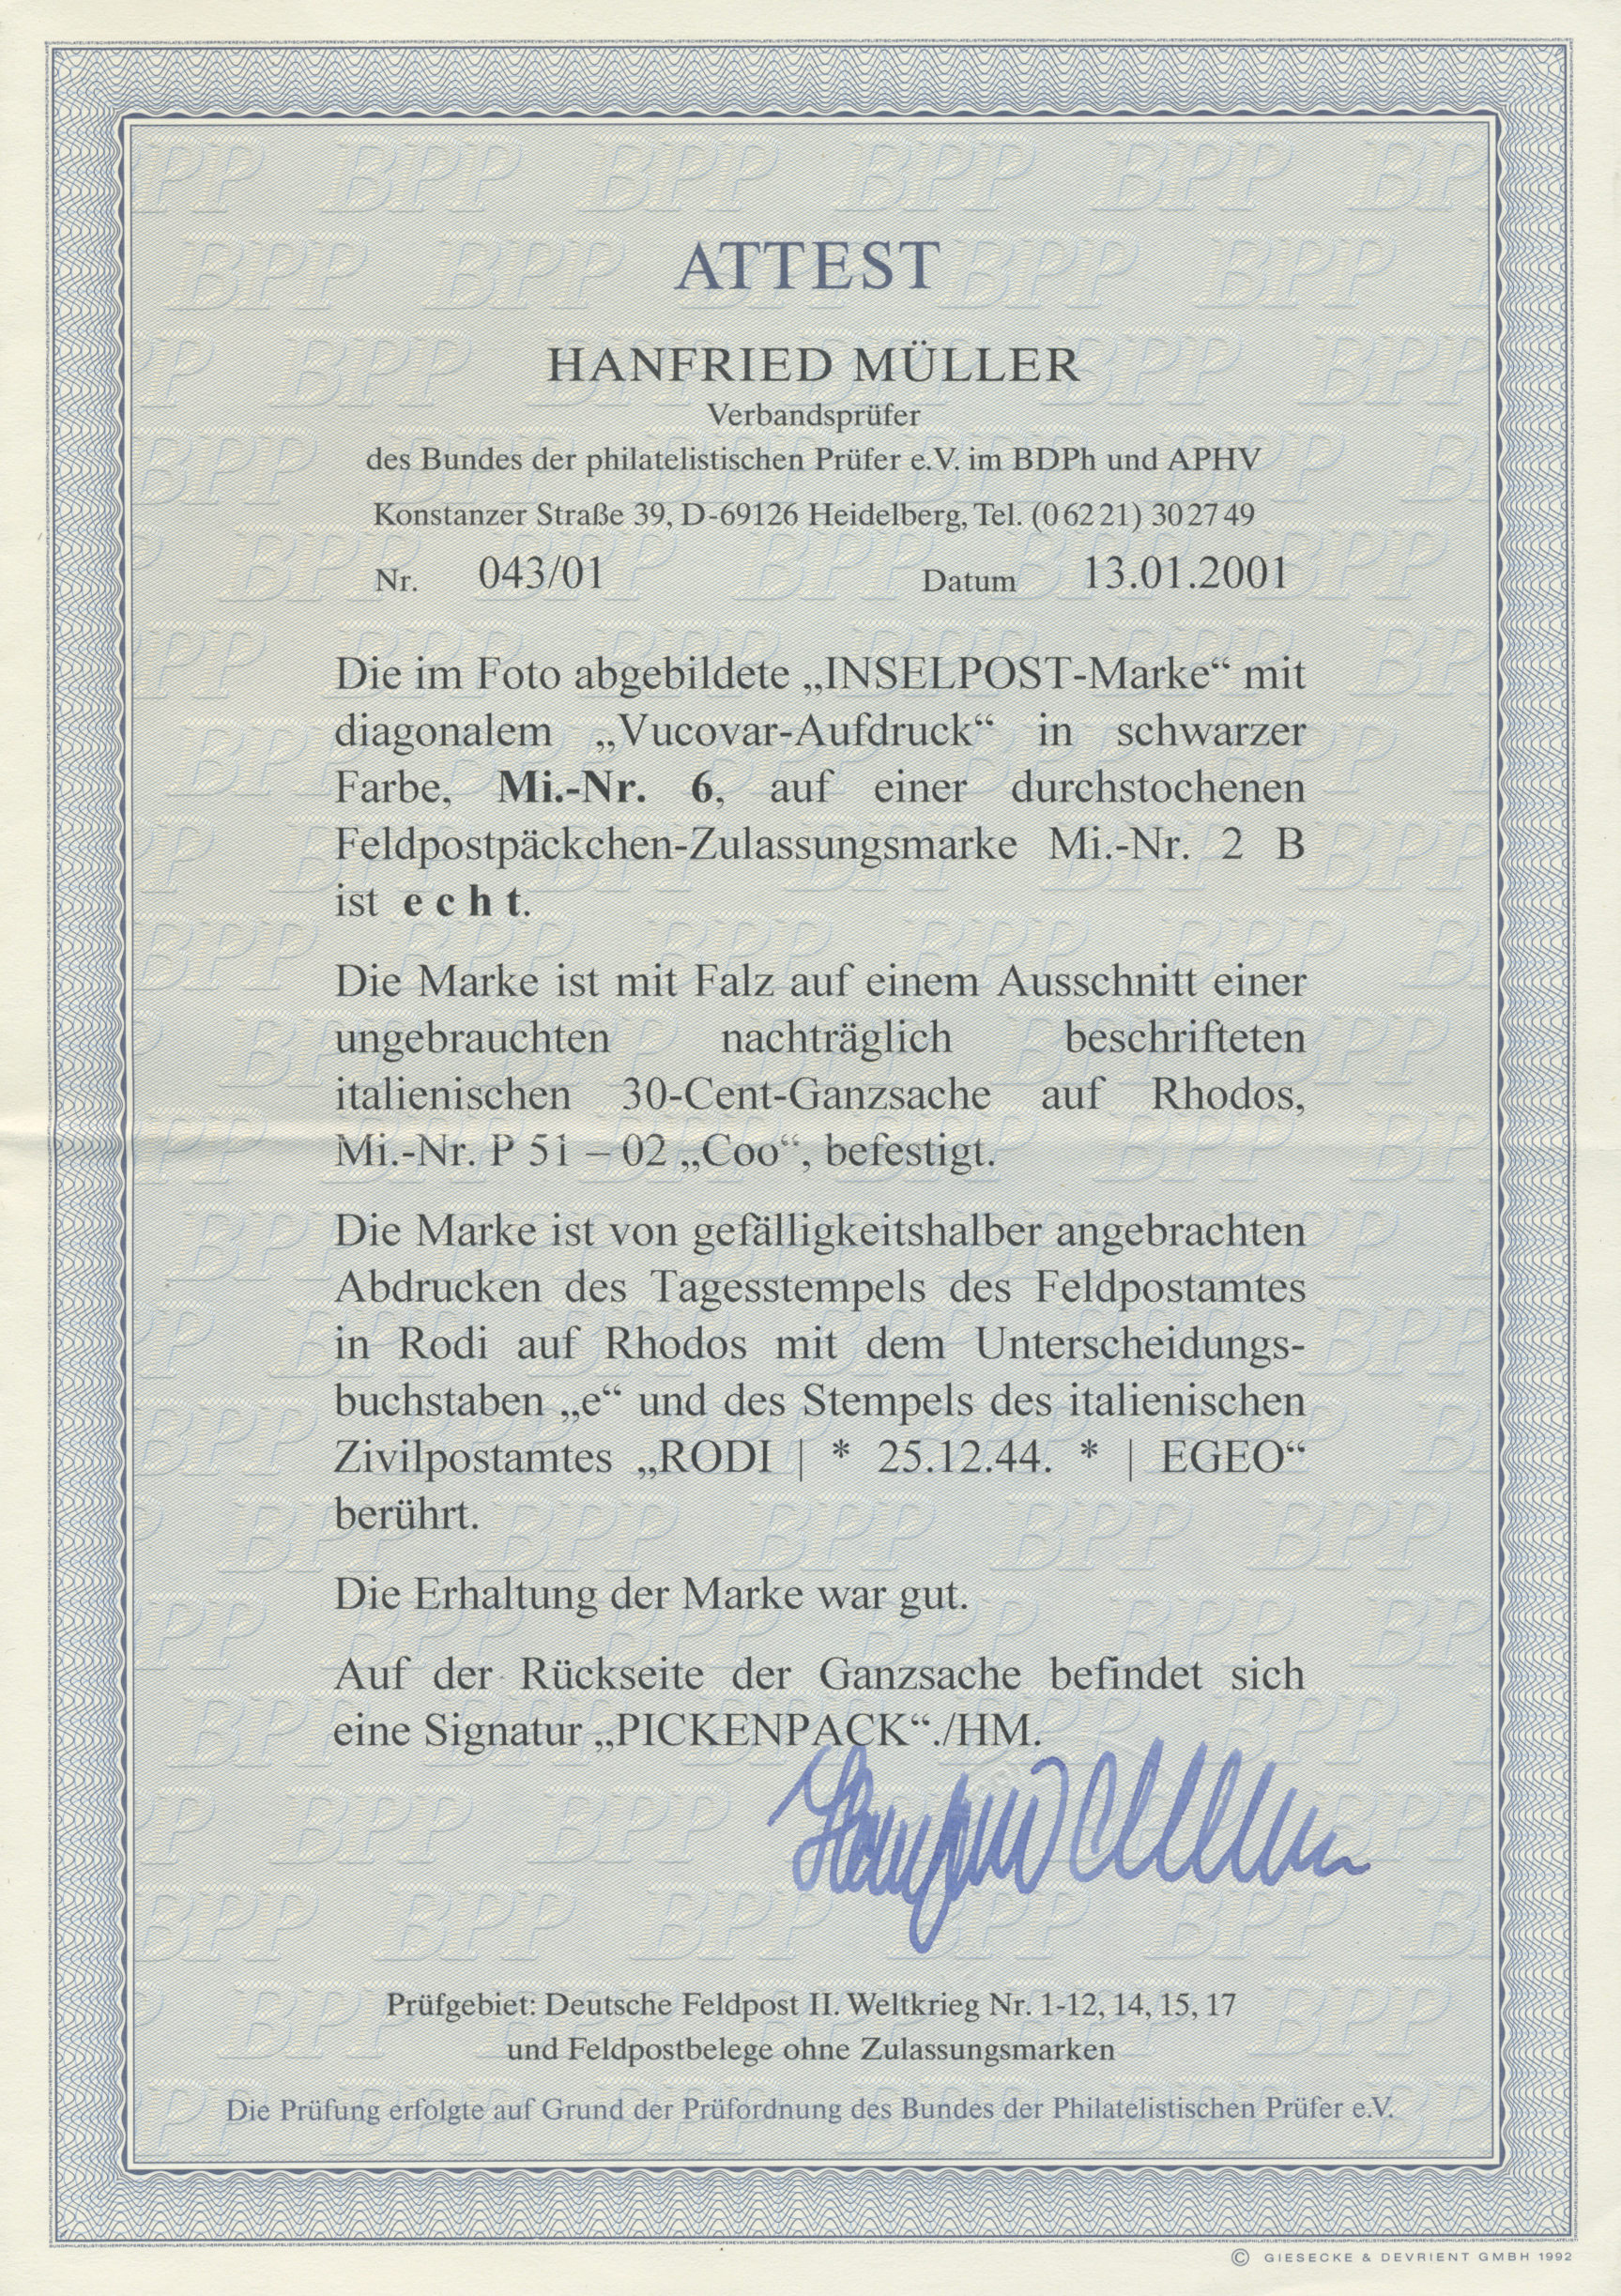 Stamp Auction - feldpostmarken - Germany Auction #42 Day 5